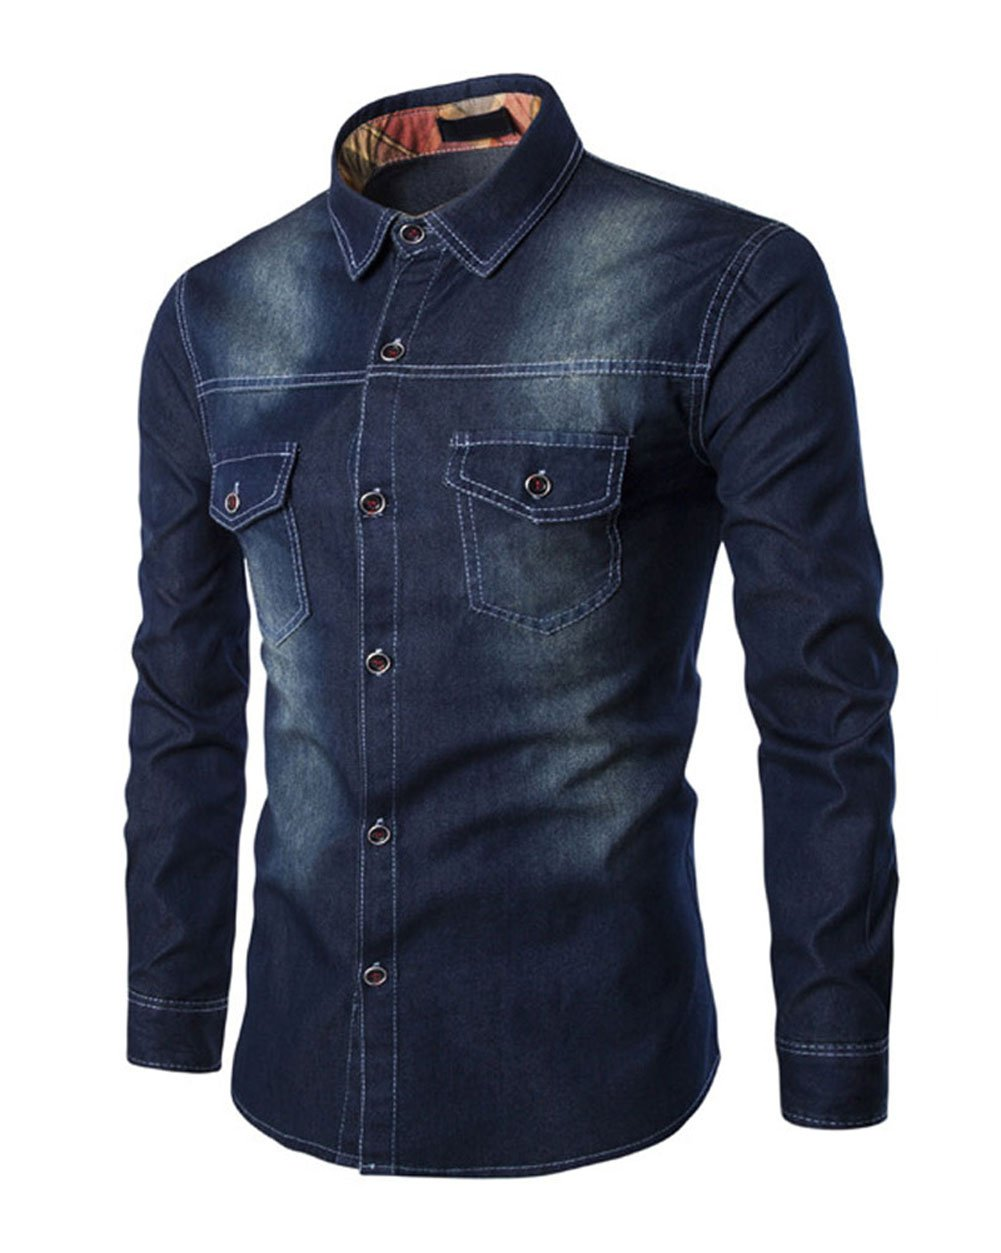 WULFUL Men's Denim Slim Fit Long Sleeve Button Shirt Casual Work Dress Shirt Dark Blue XS